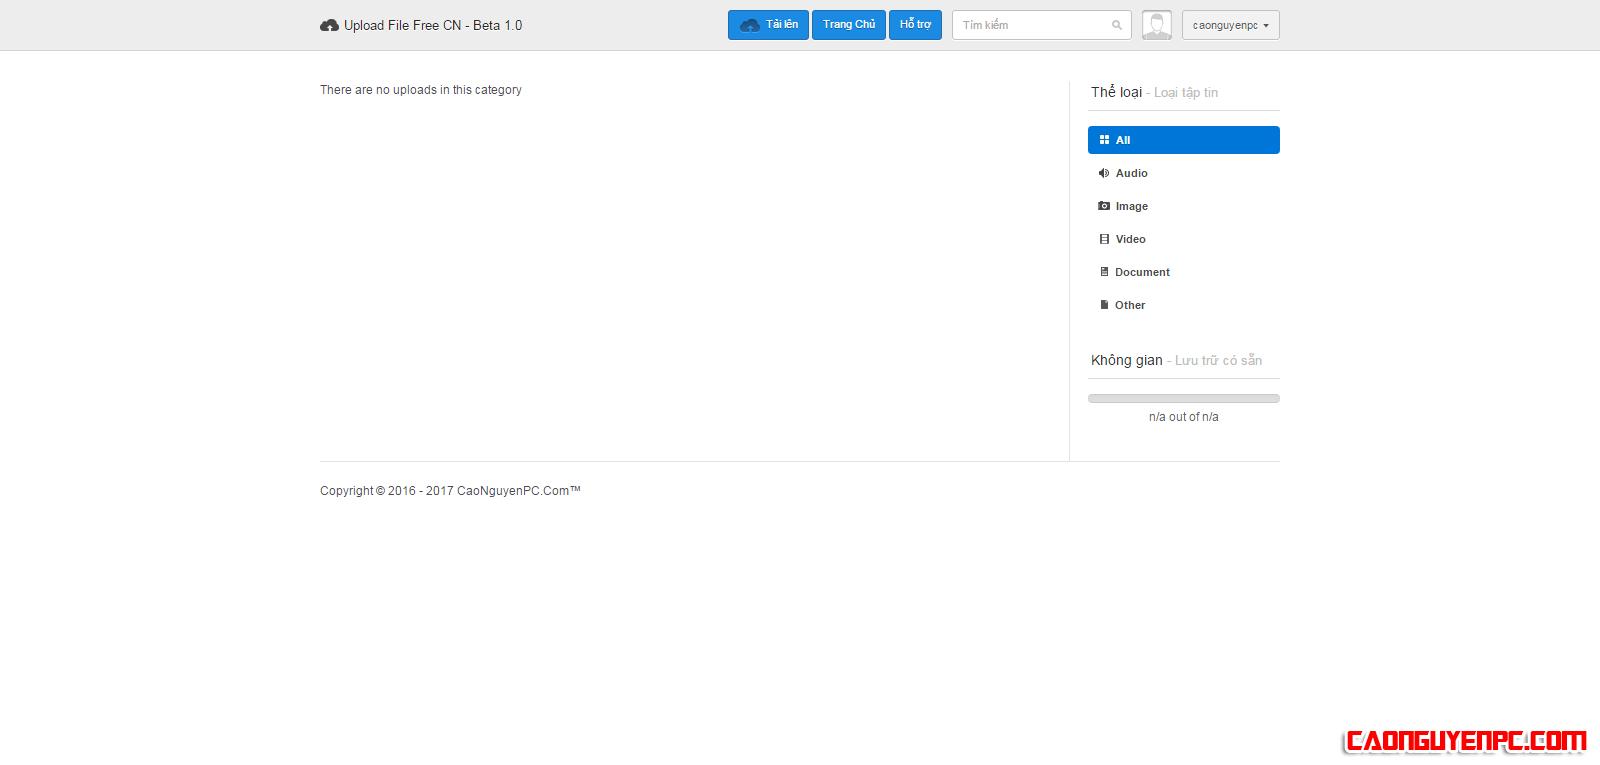 [Thông báo] Ra mắt trang Upload dữ liệu Upload File Free CN – Beta 1.0!